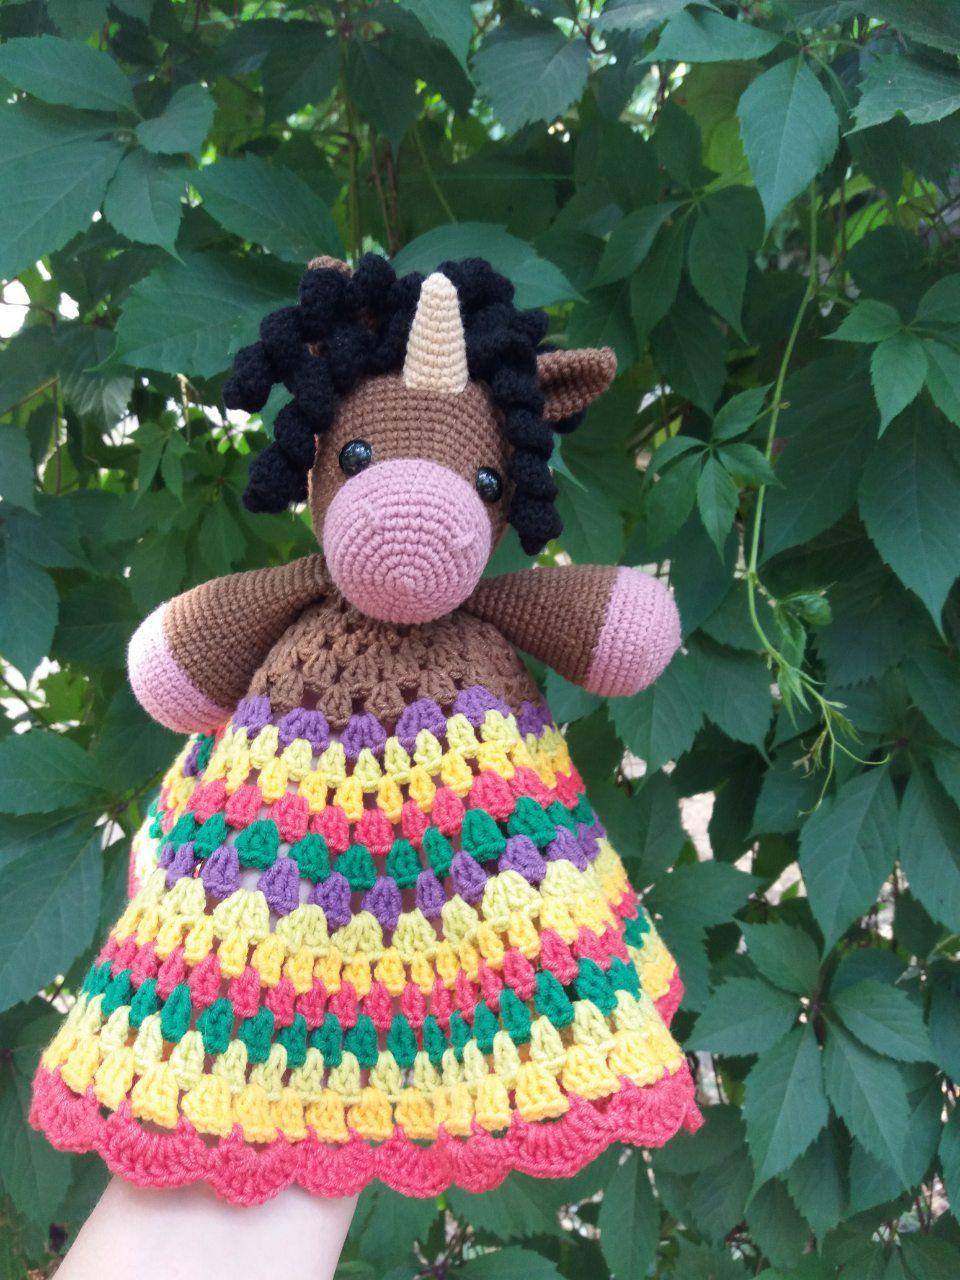 crochet security blanket toy unicorn hand made gift for baby shower, cuddle blanket amigurumi stuffed animal READY TO SHIP #crochetsecurityblanket